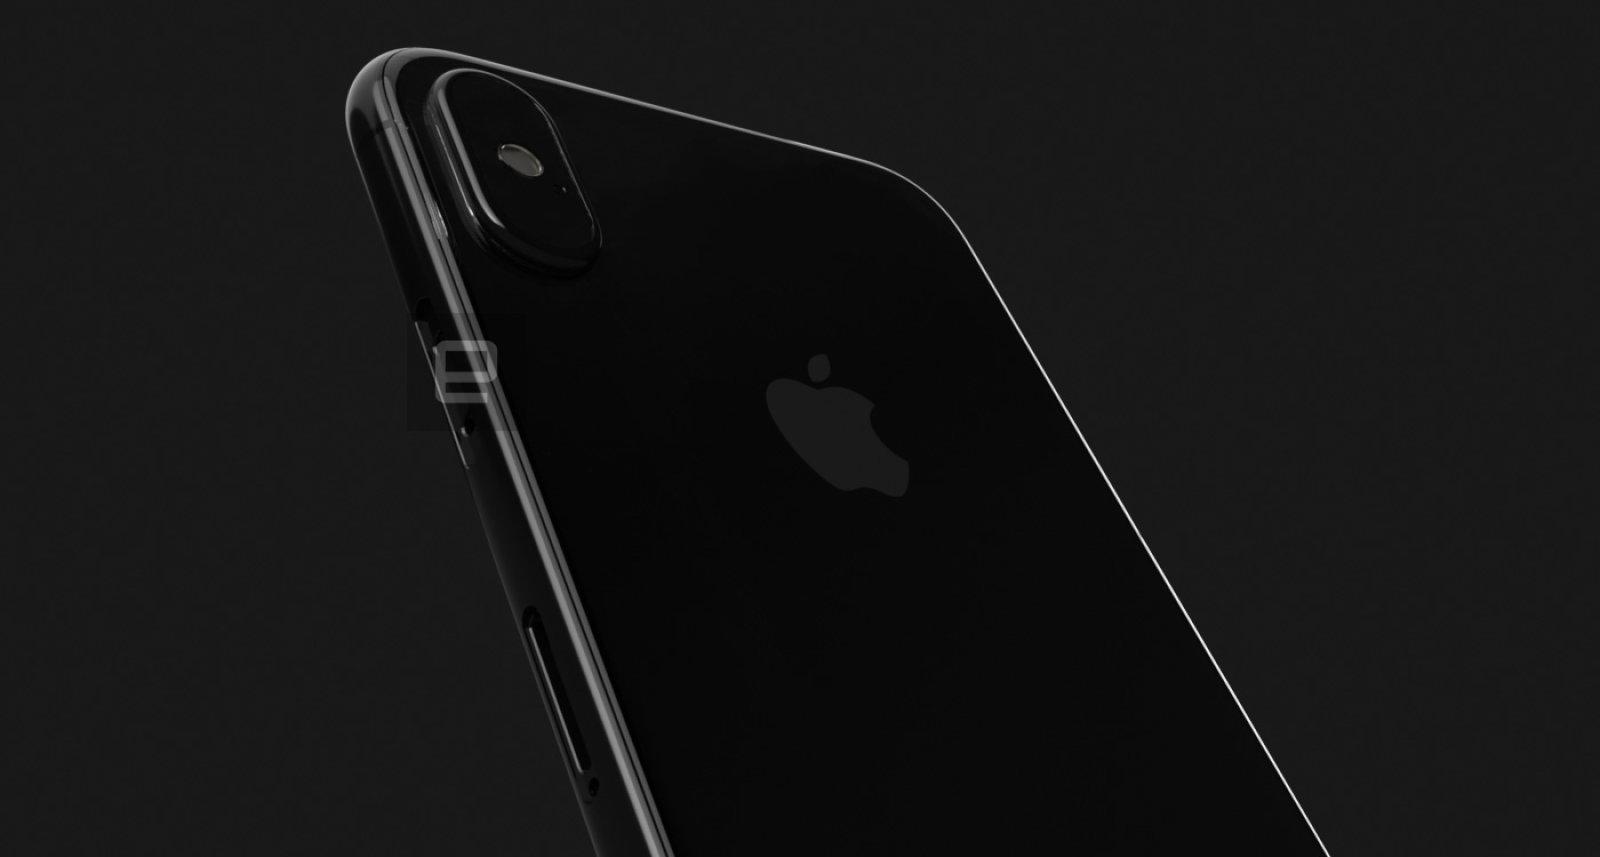 Apple Leak lüftet noch mehr Geheimnisse rings um iPhone-Kamera und Sensor